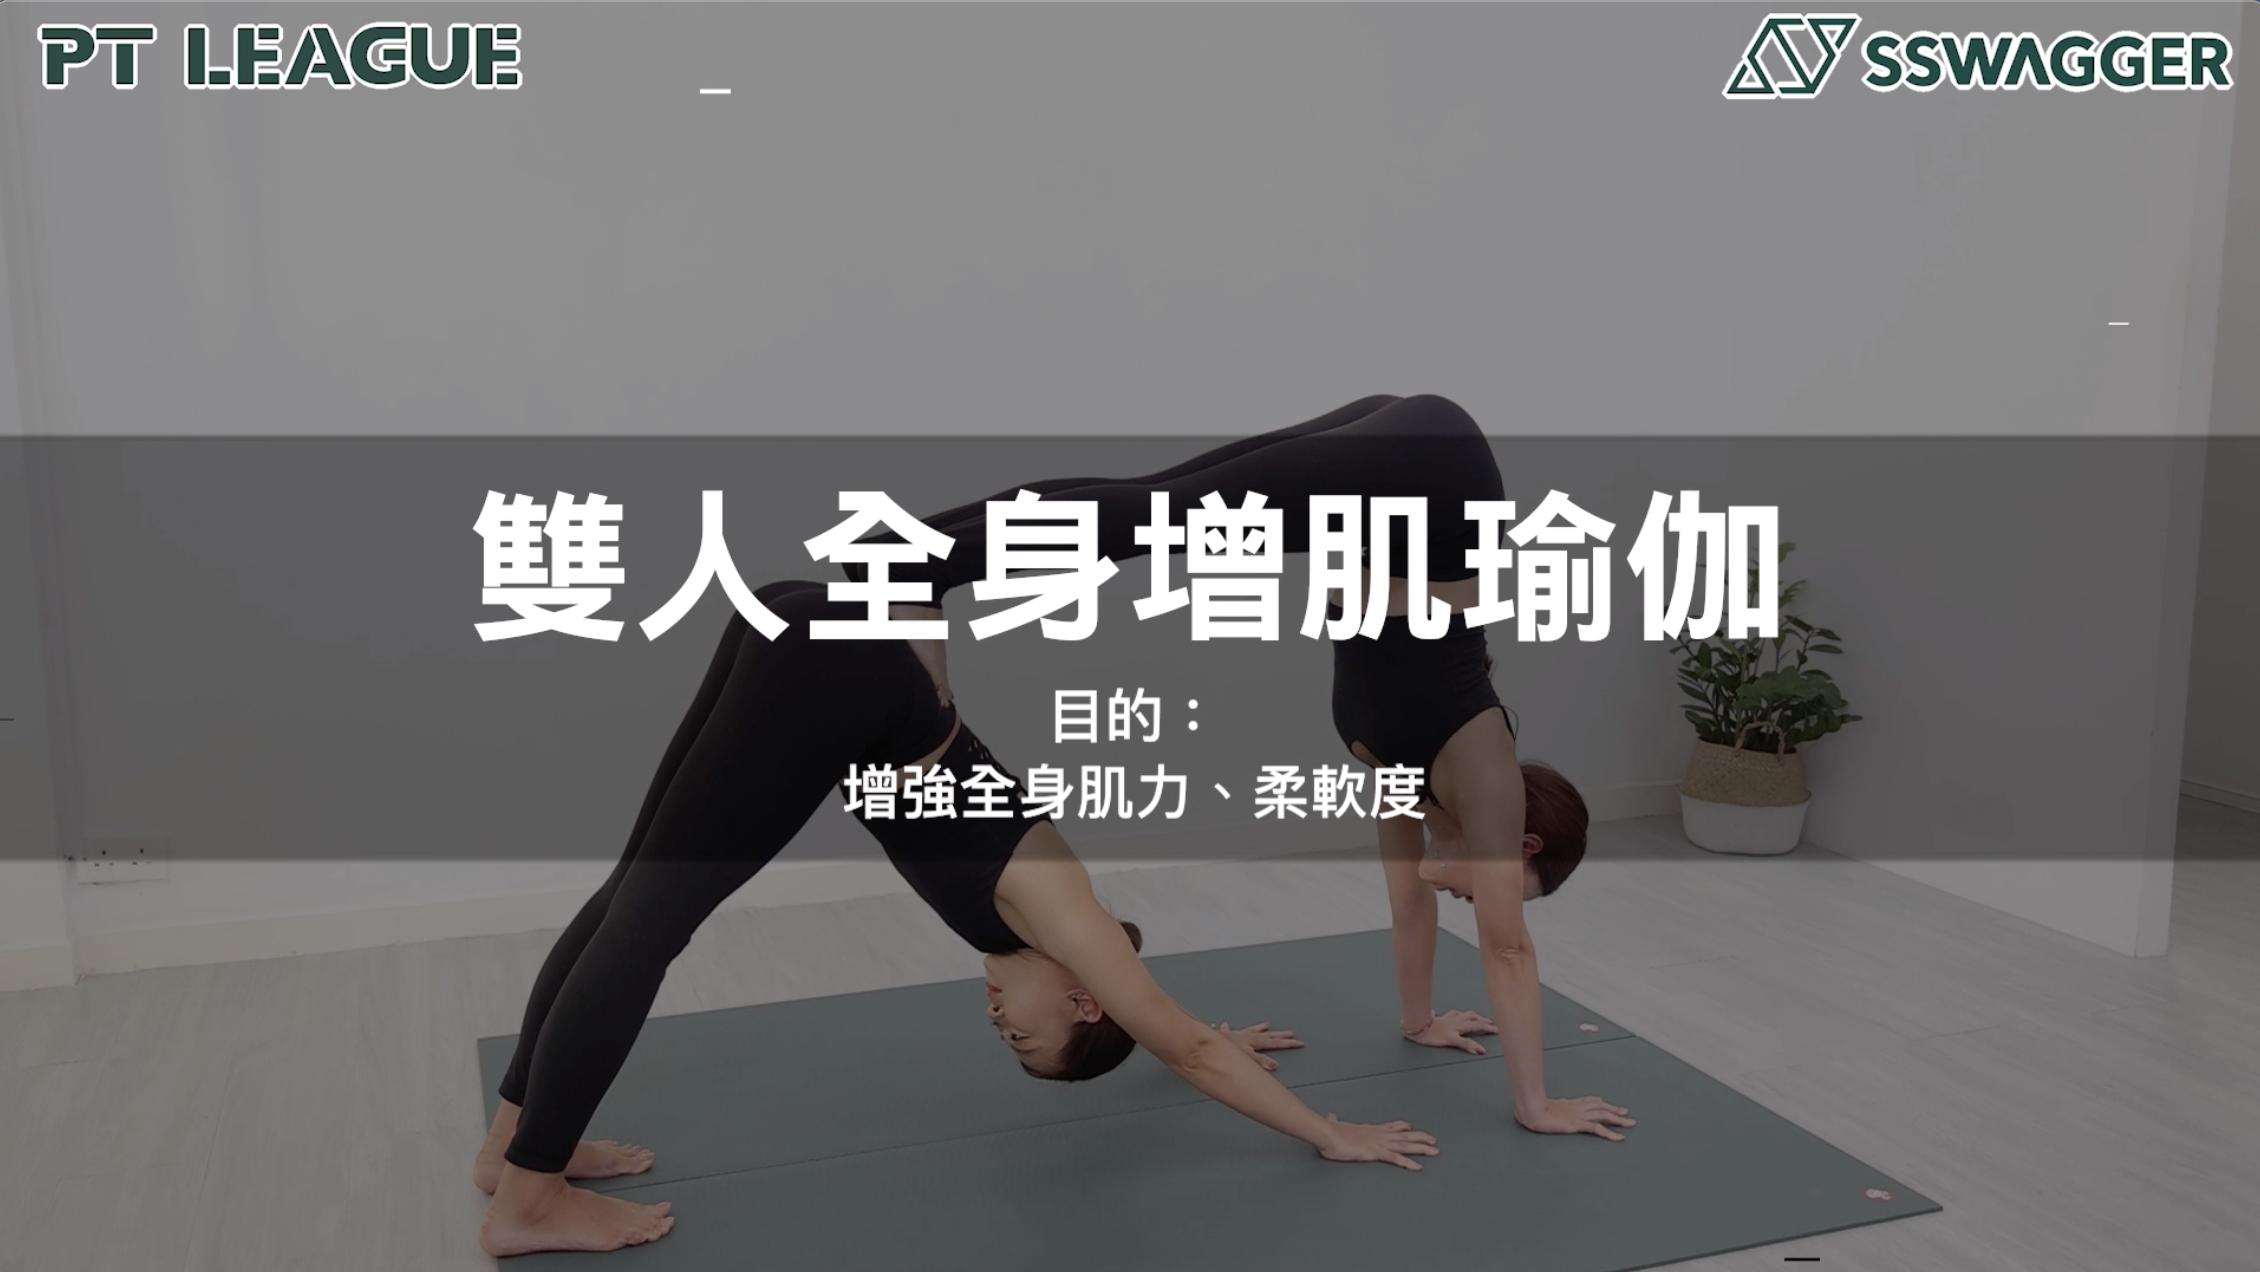 【SSwagger Academy - PT League】雙人全身增肌瑜伽